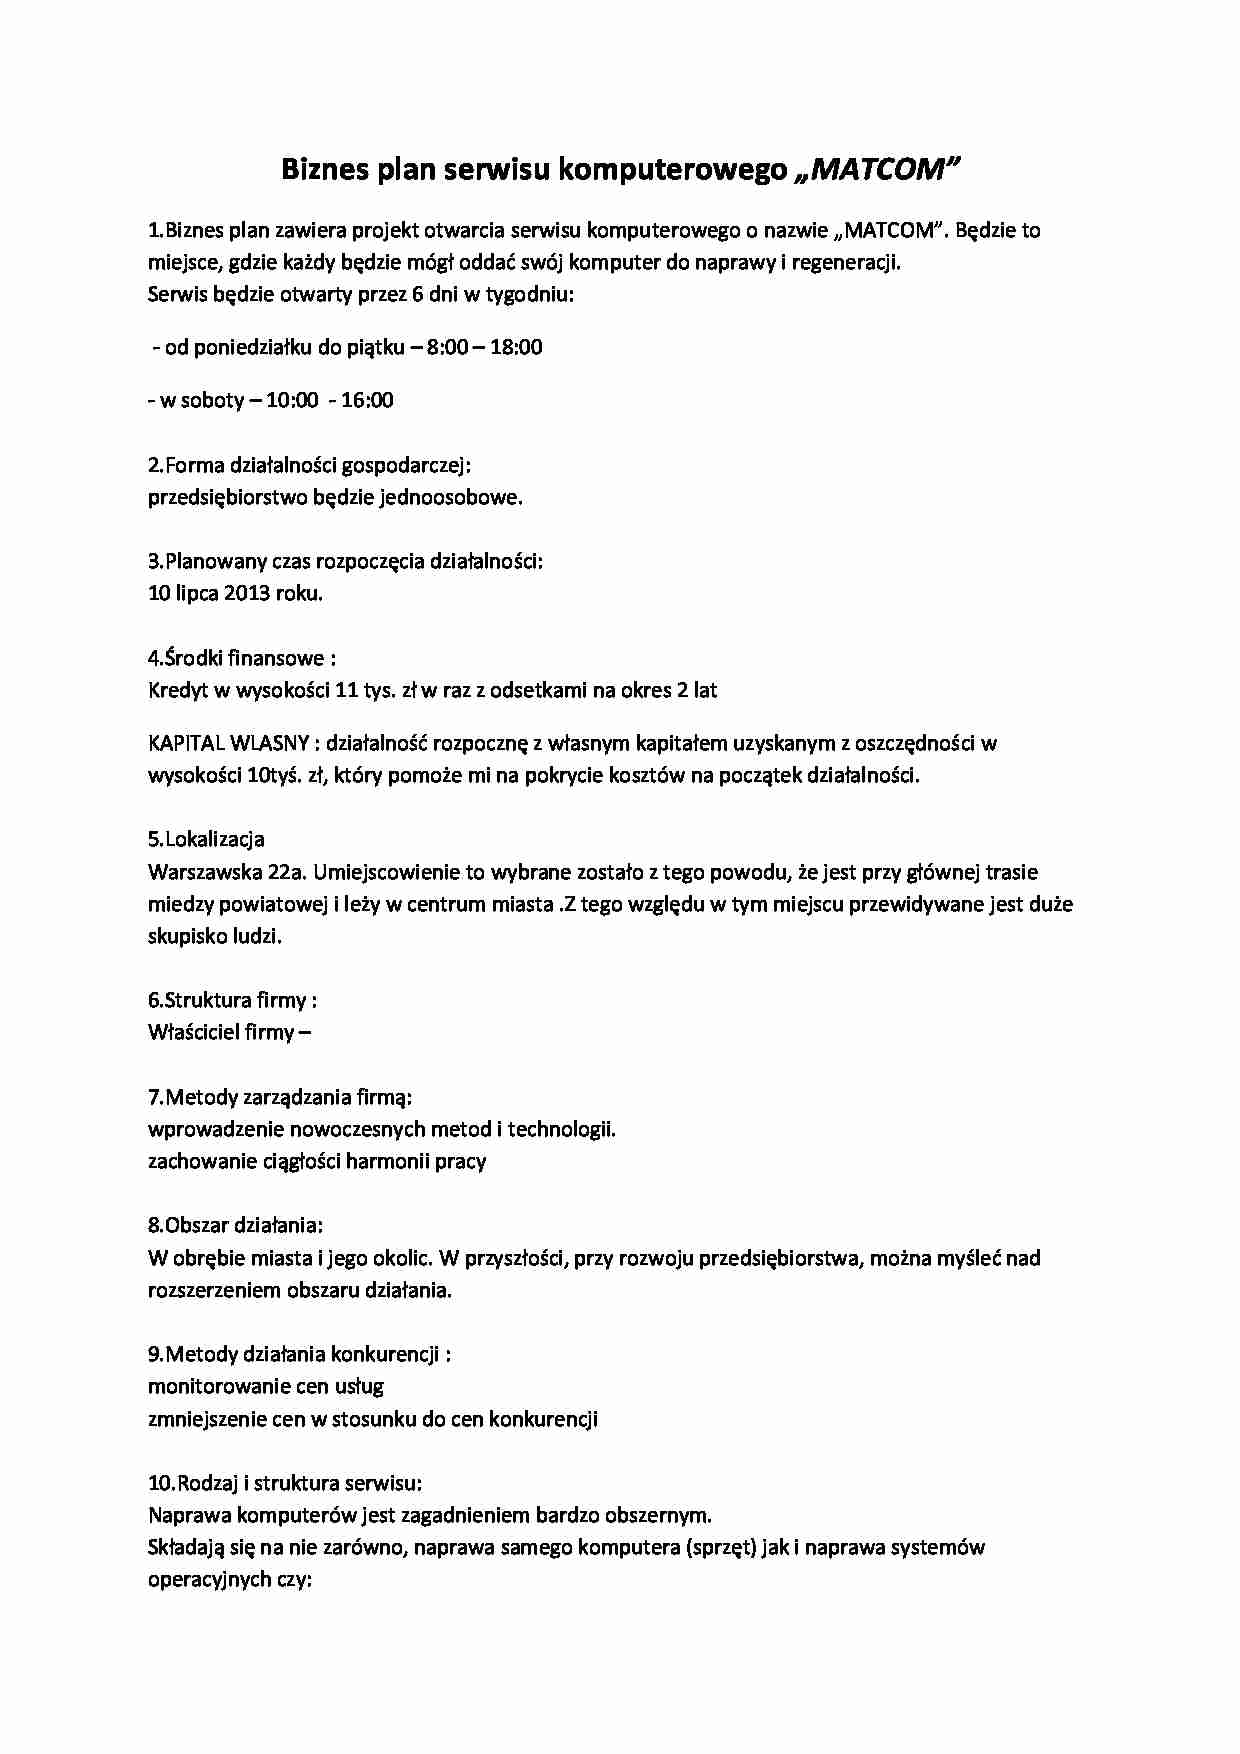 biznes plan serwisu komputerowego  u201ematcom u201d